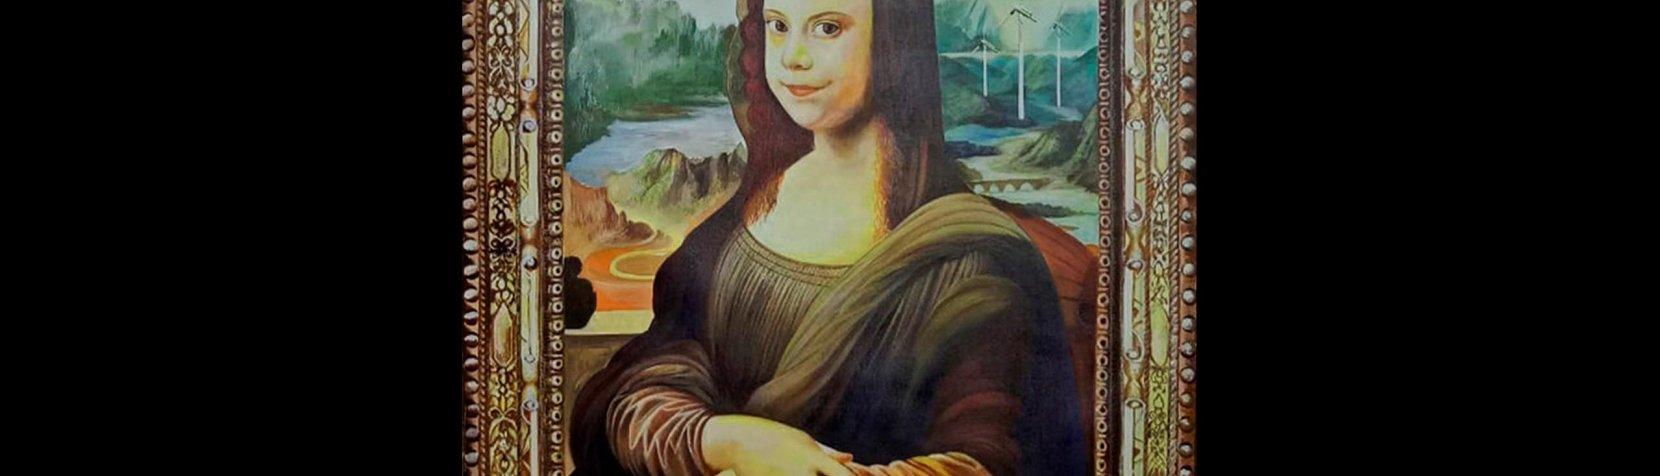 Greta Turnberg malet som Monalisa